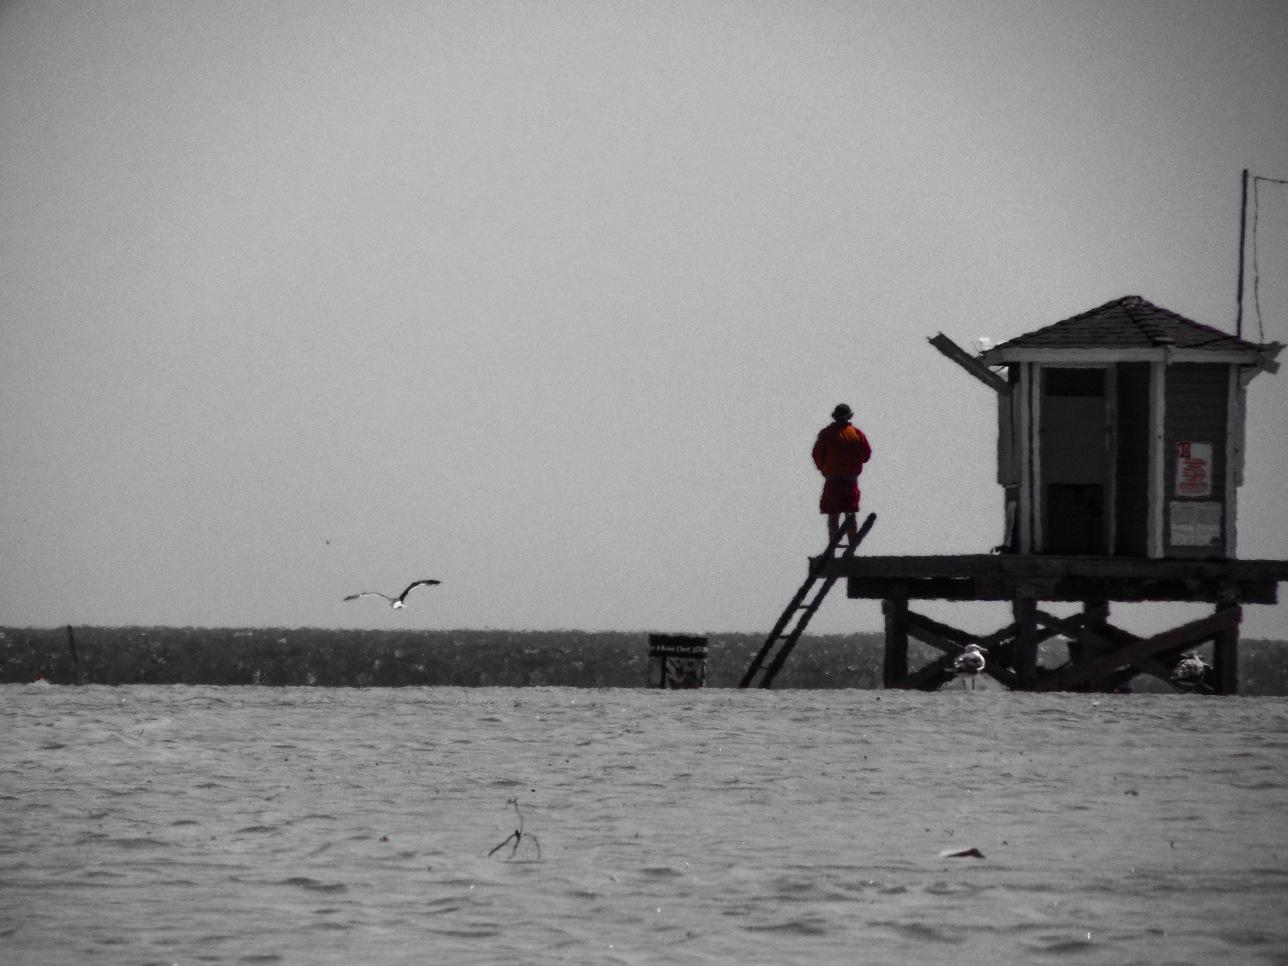 Grey beach, red jacket